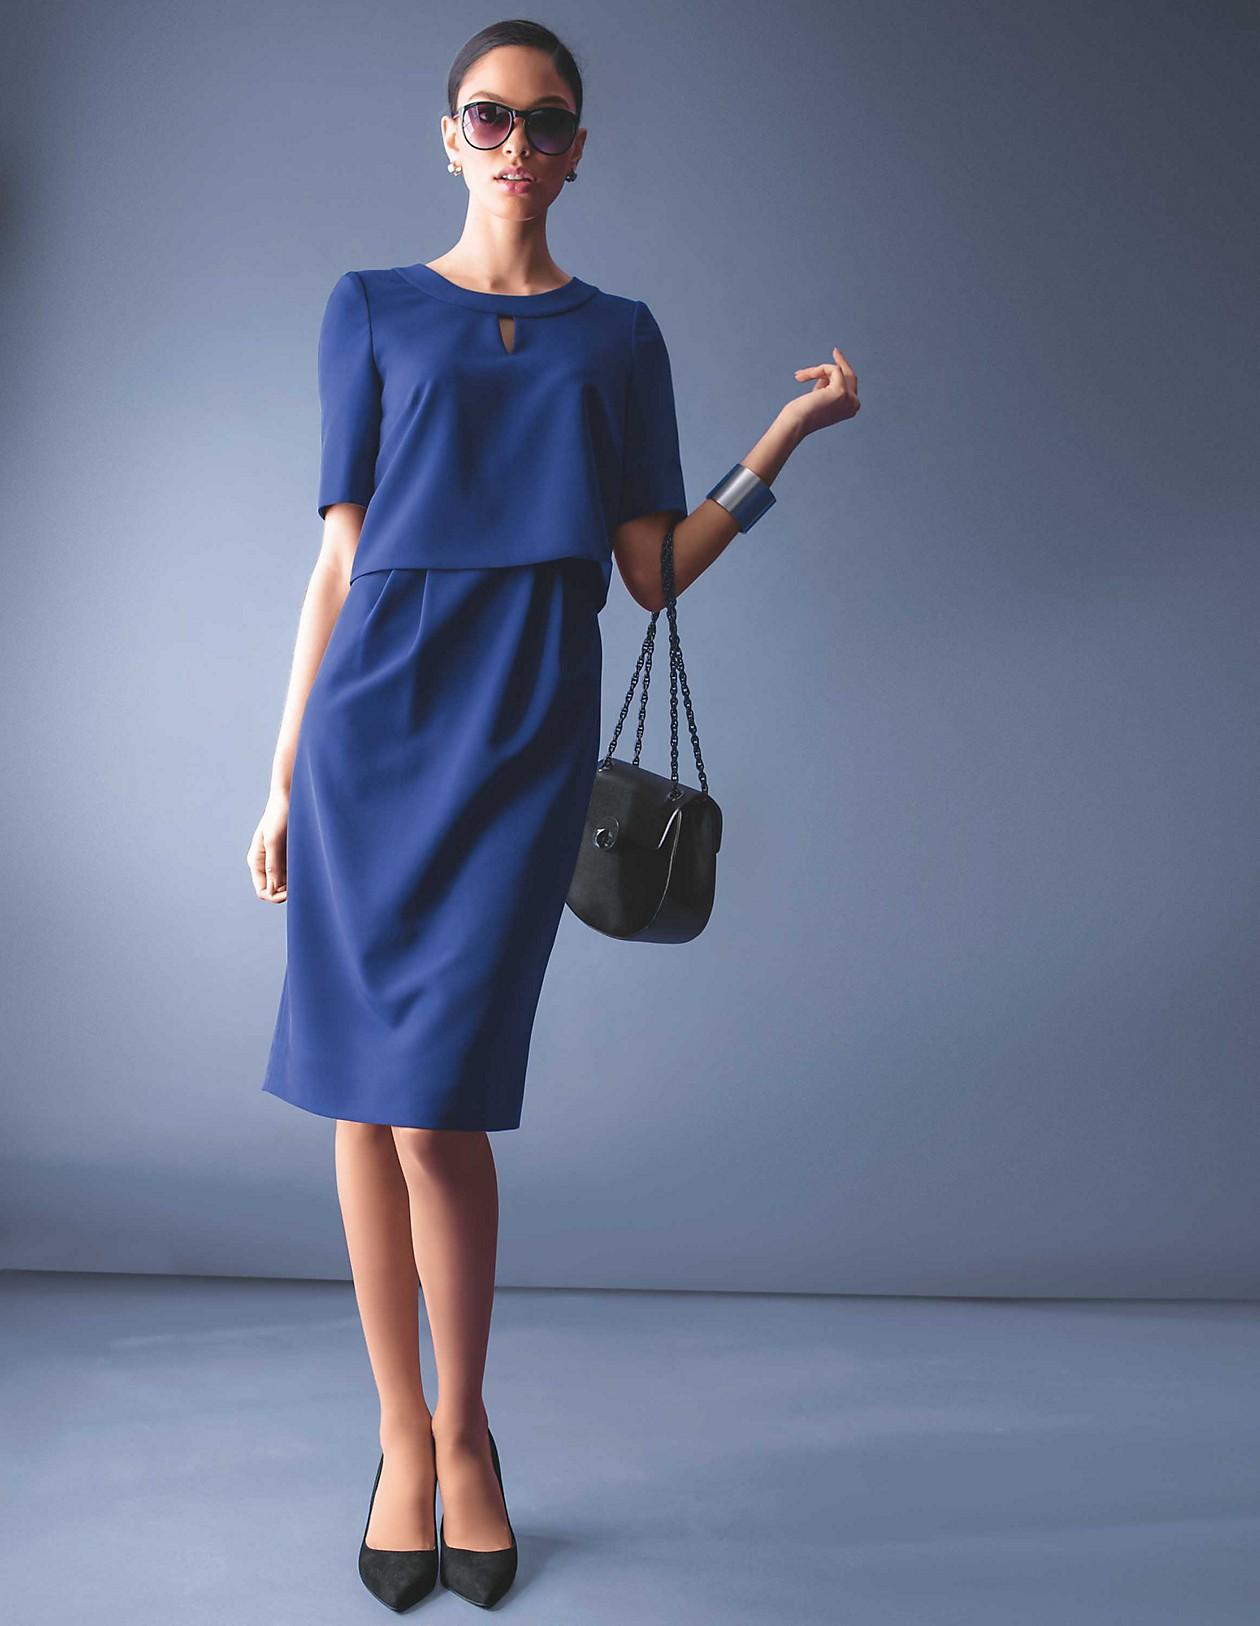 new product da6e5 4c74c Kleid im Layer-Look, tintenblau, blau | MADELEINE Mode